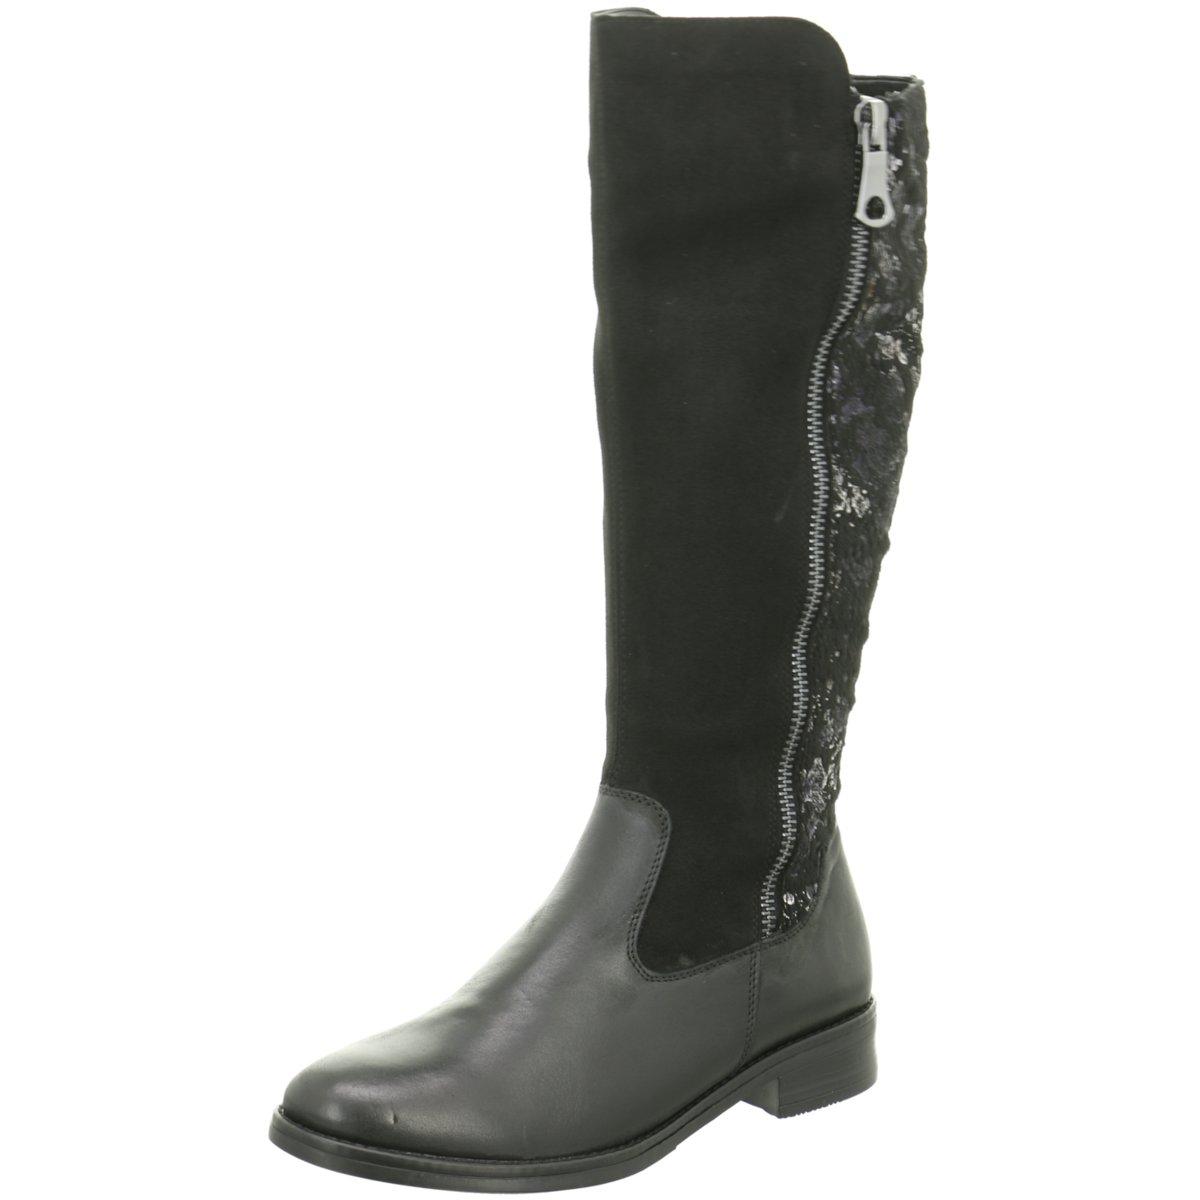 Remonte Damen D8577-01 Stiefel D8577-01 Damen schwarz 370729 ed0e85